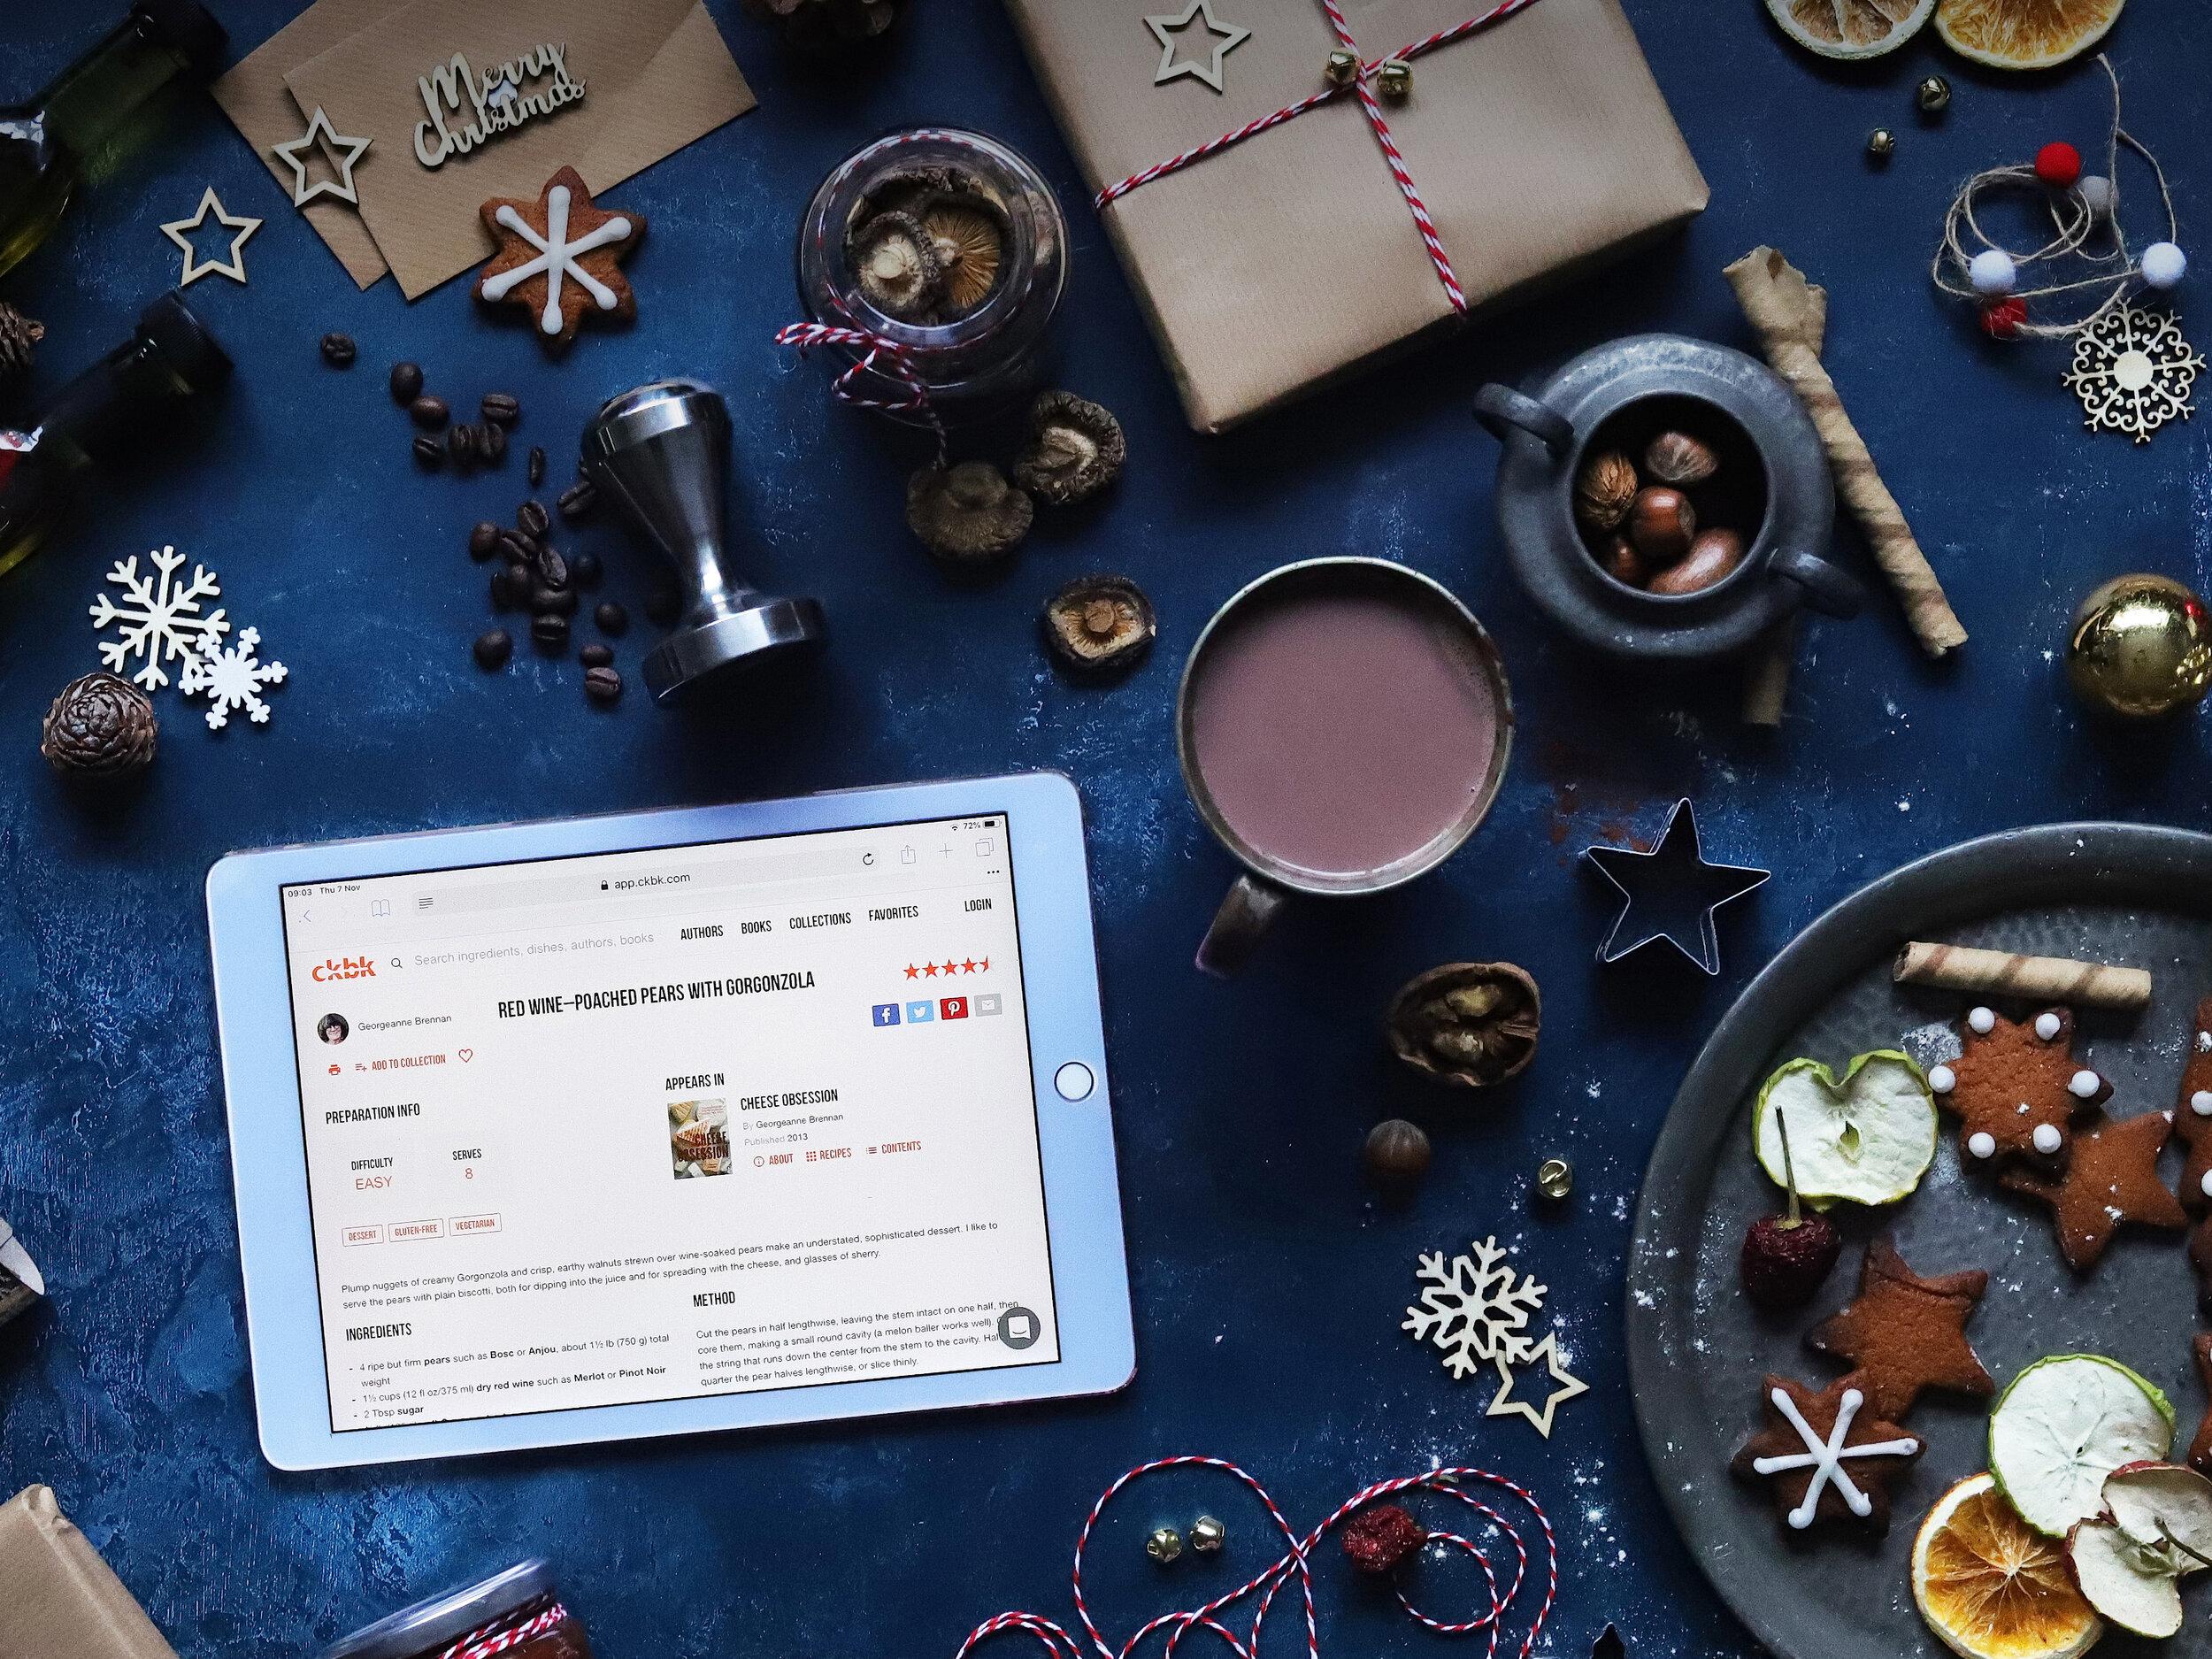 ckbk+gift+subs+crop.jpg